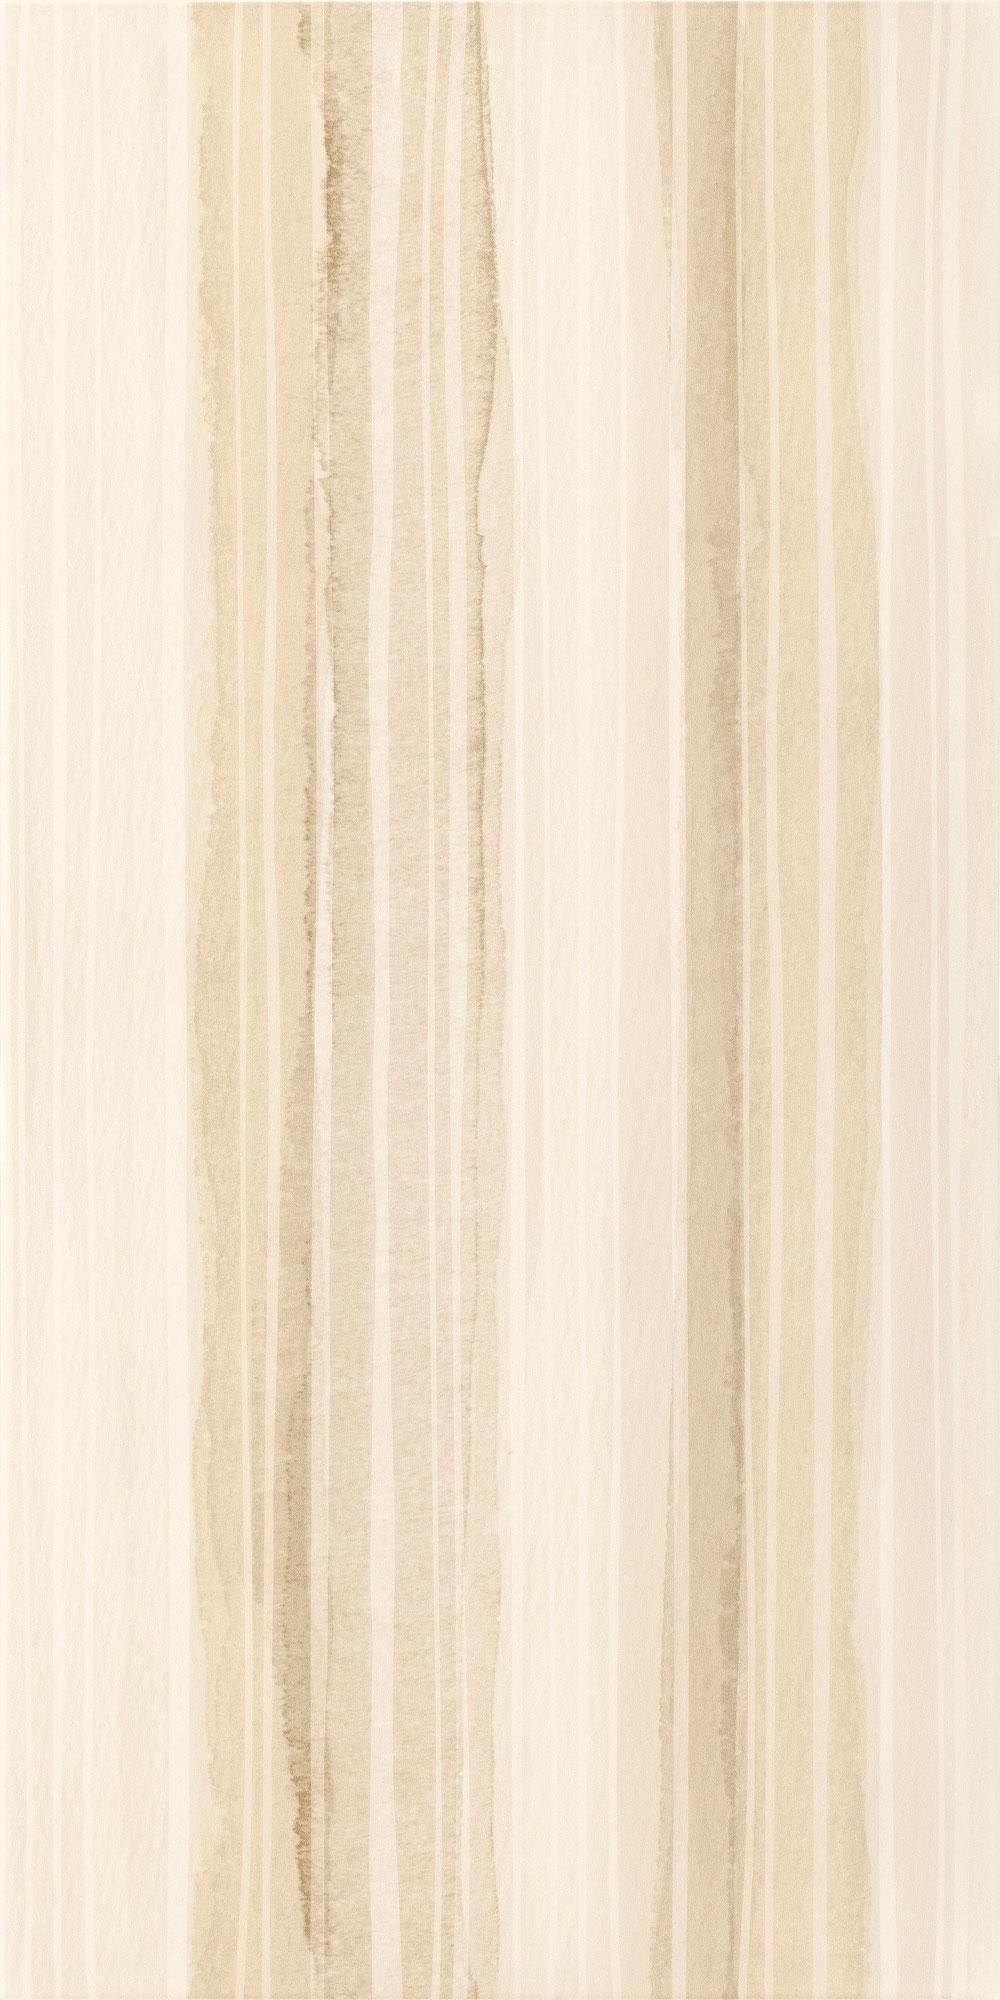 Настенная плитка Ceramika Paradyz Coraline Beige paski 30x60 (1,44) paradyz vanilla beige dzbanek 10x10